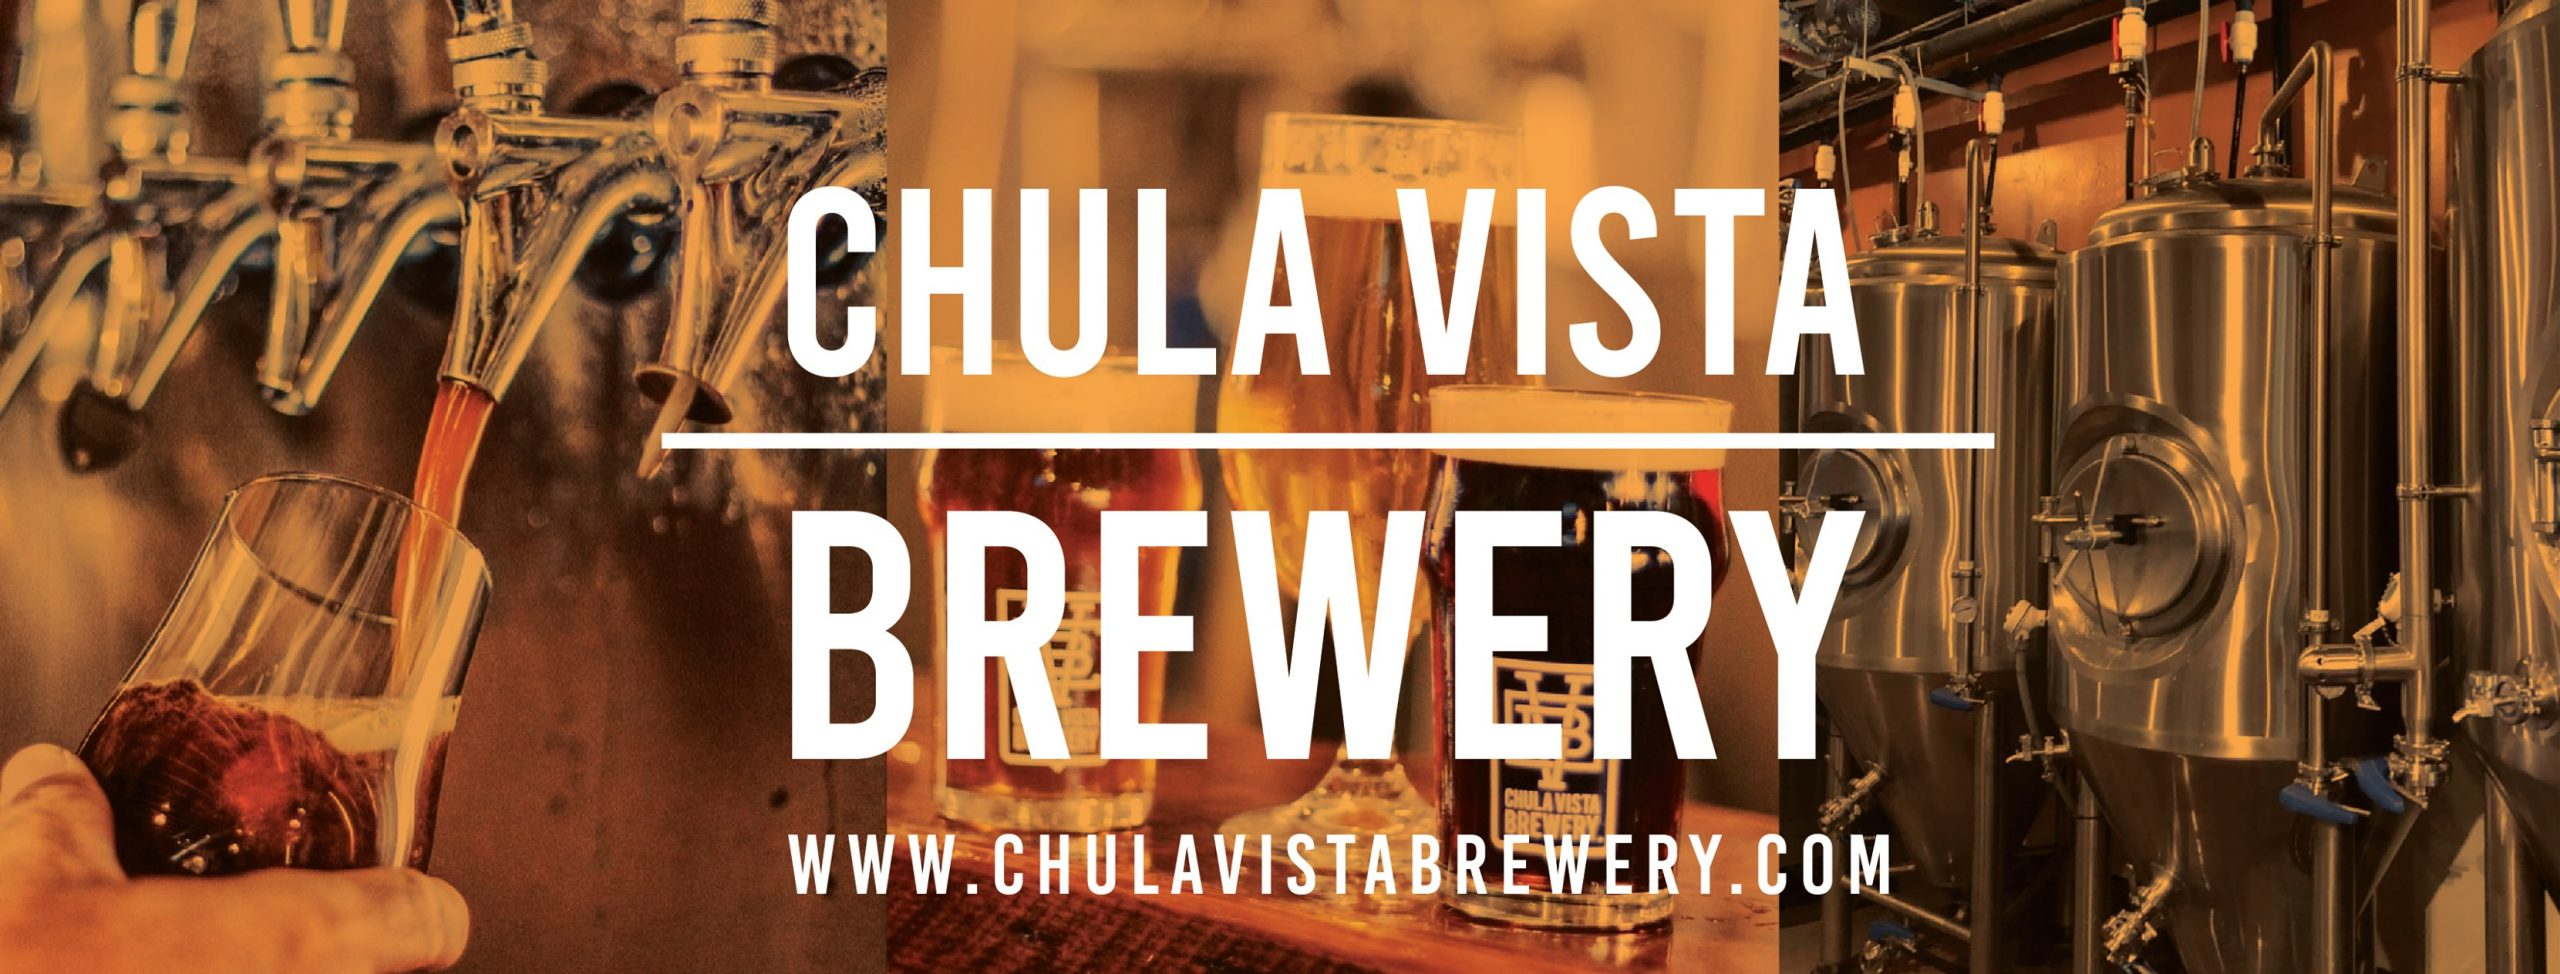 Chula Vista Brewery  – Chula Vista Black Veteran brewery